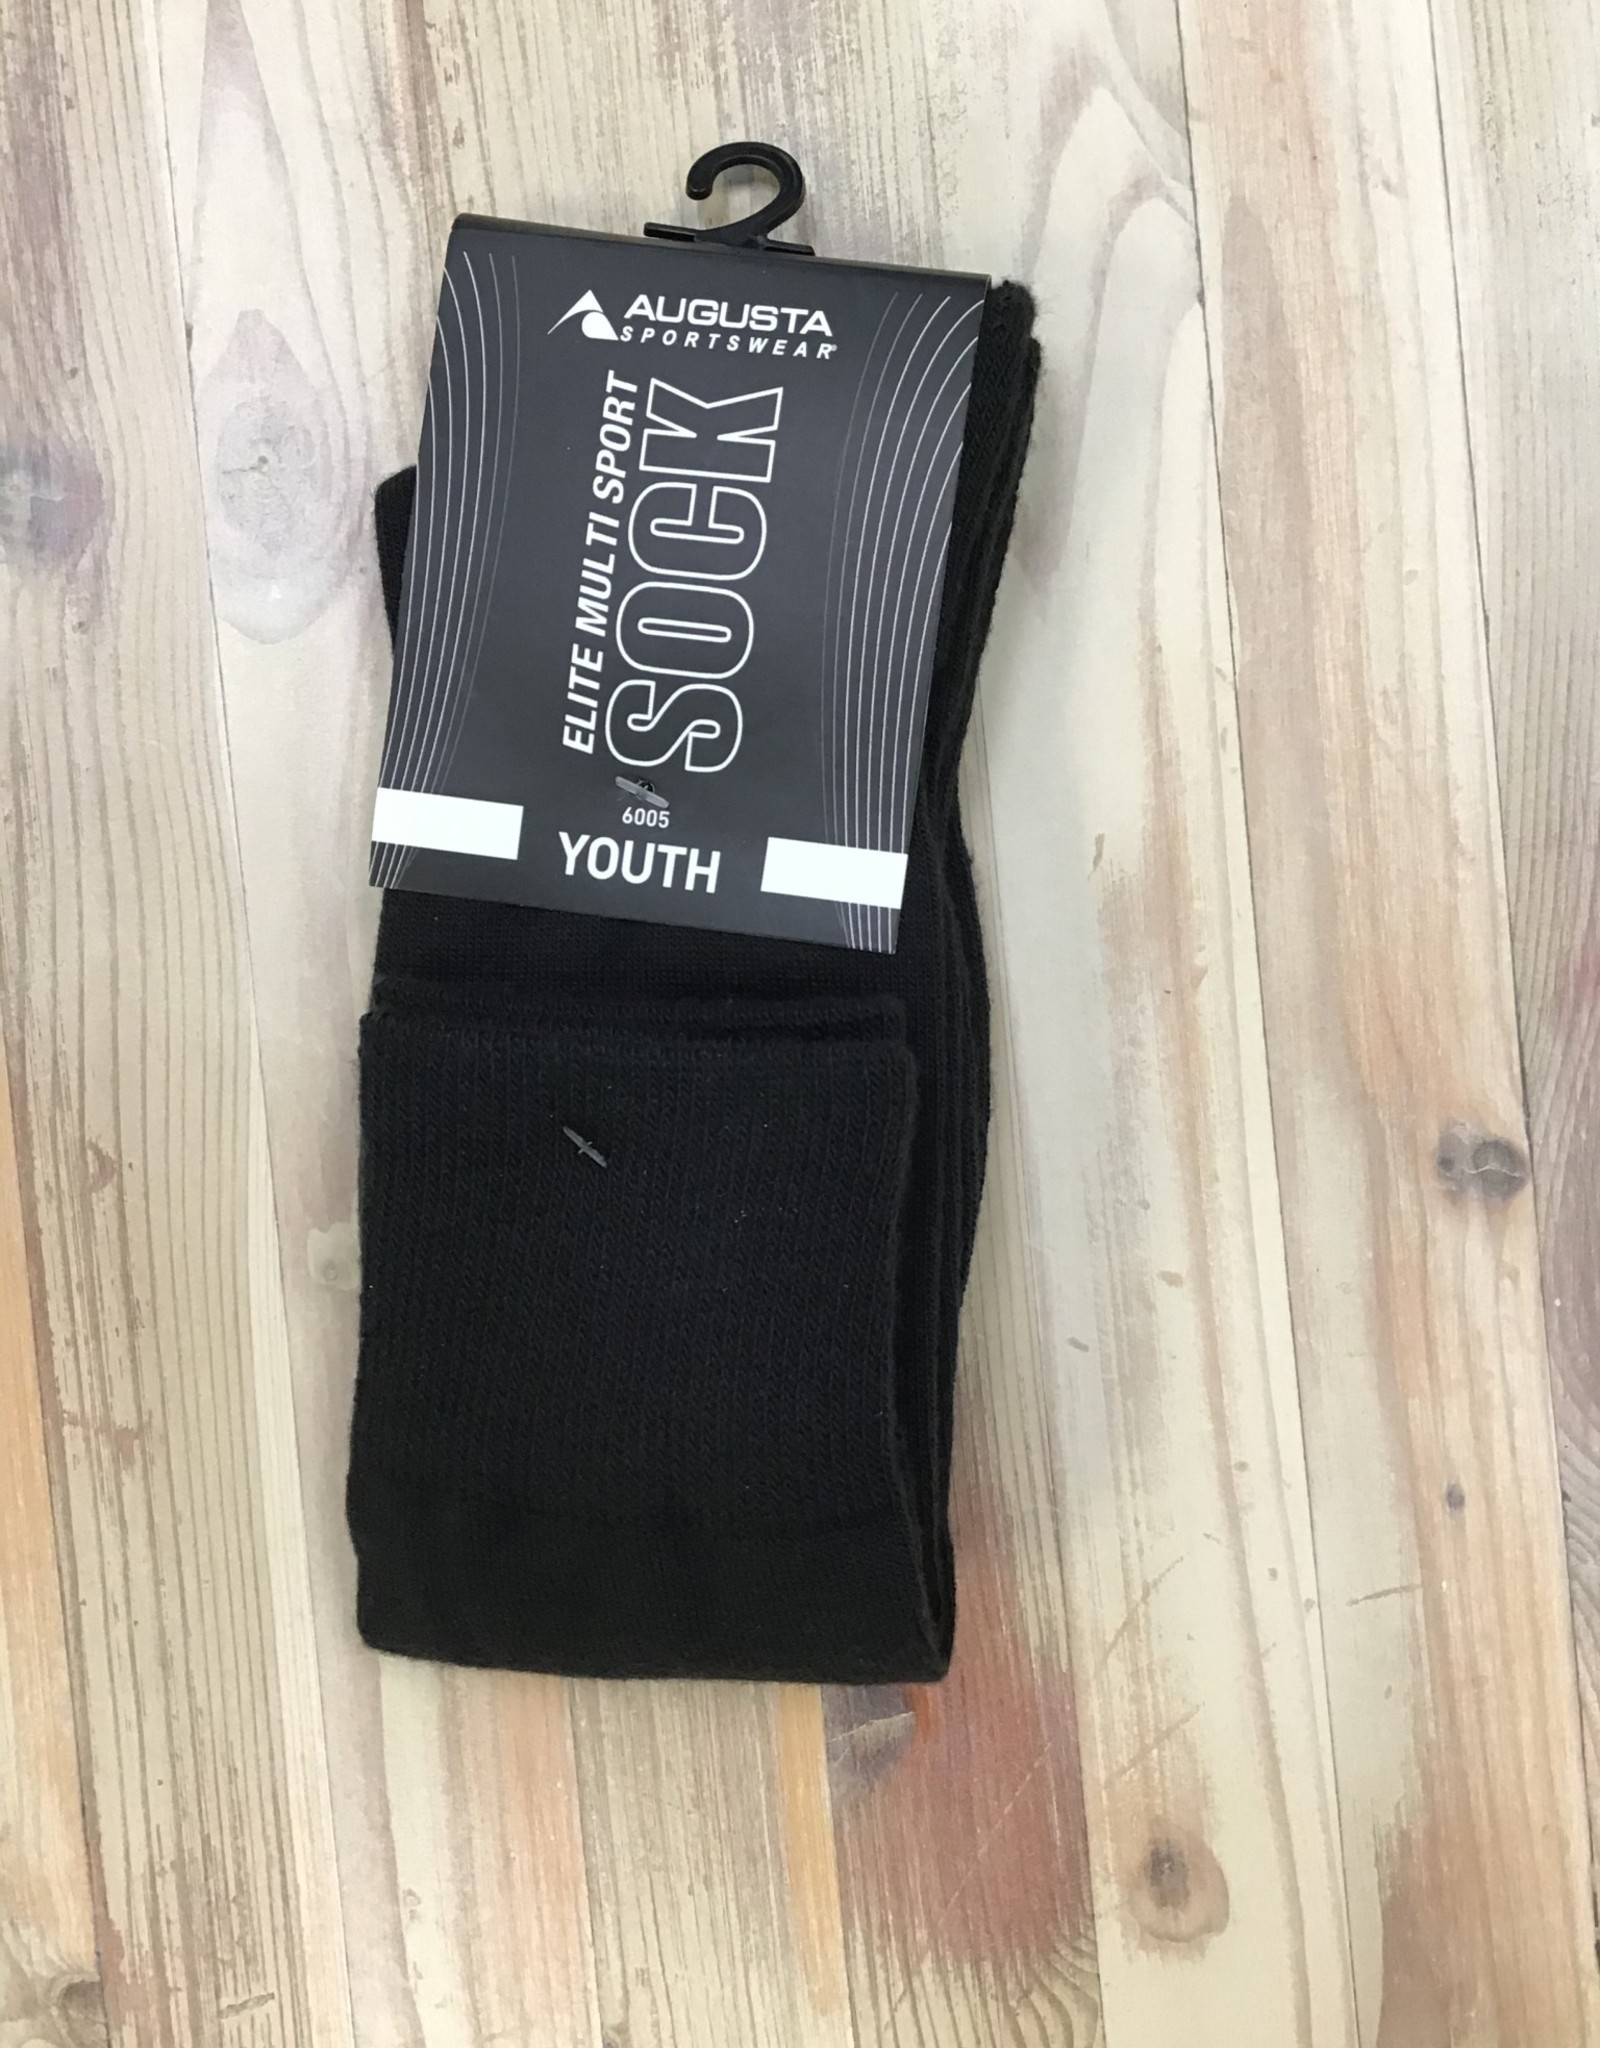 Augusta Augusta 6007 Elite Multi-Sport Socks